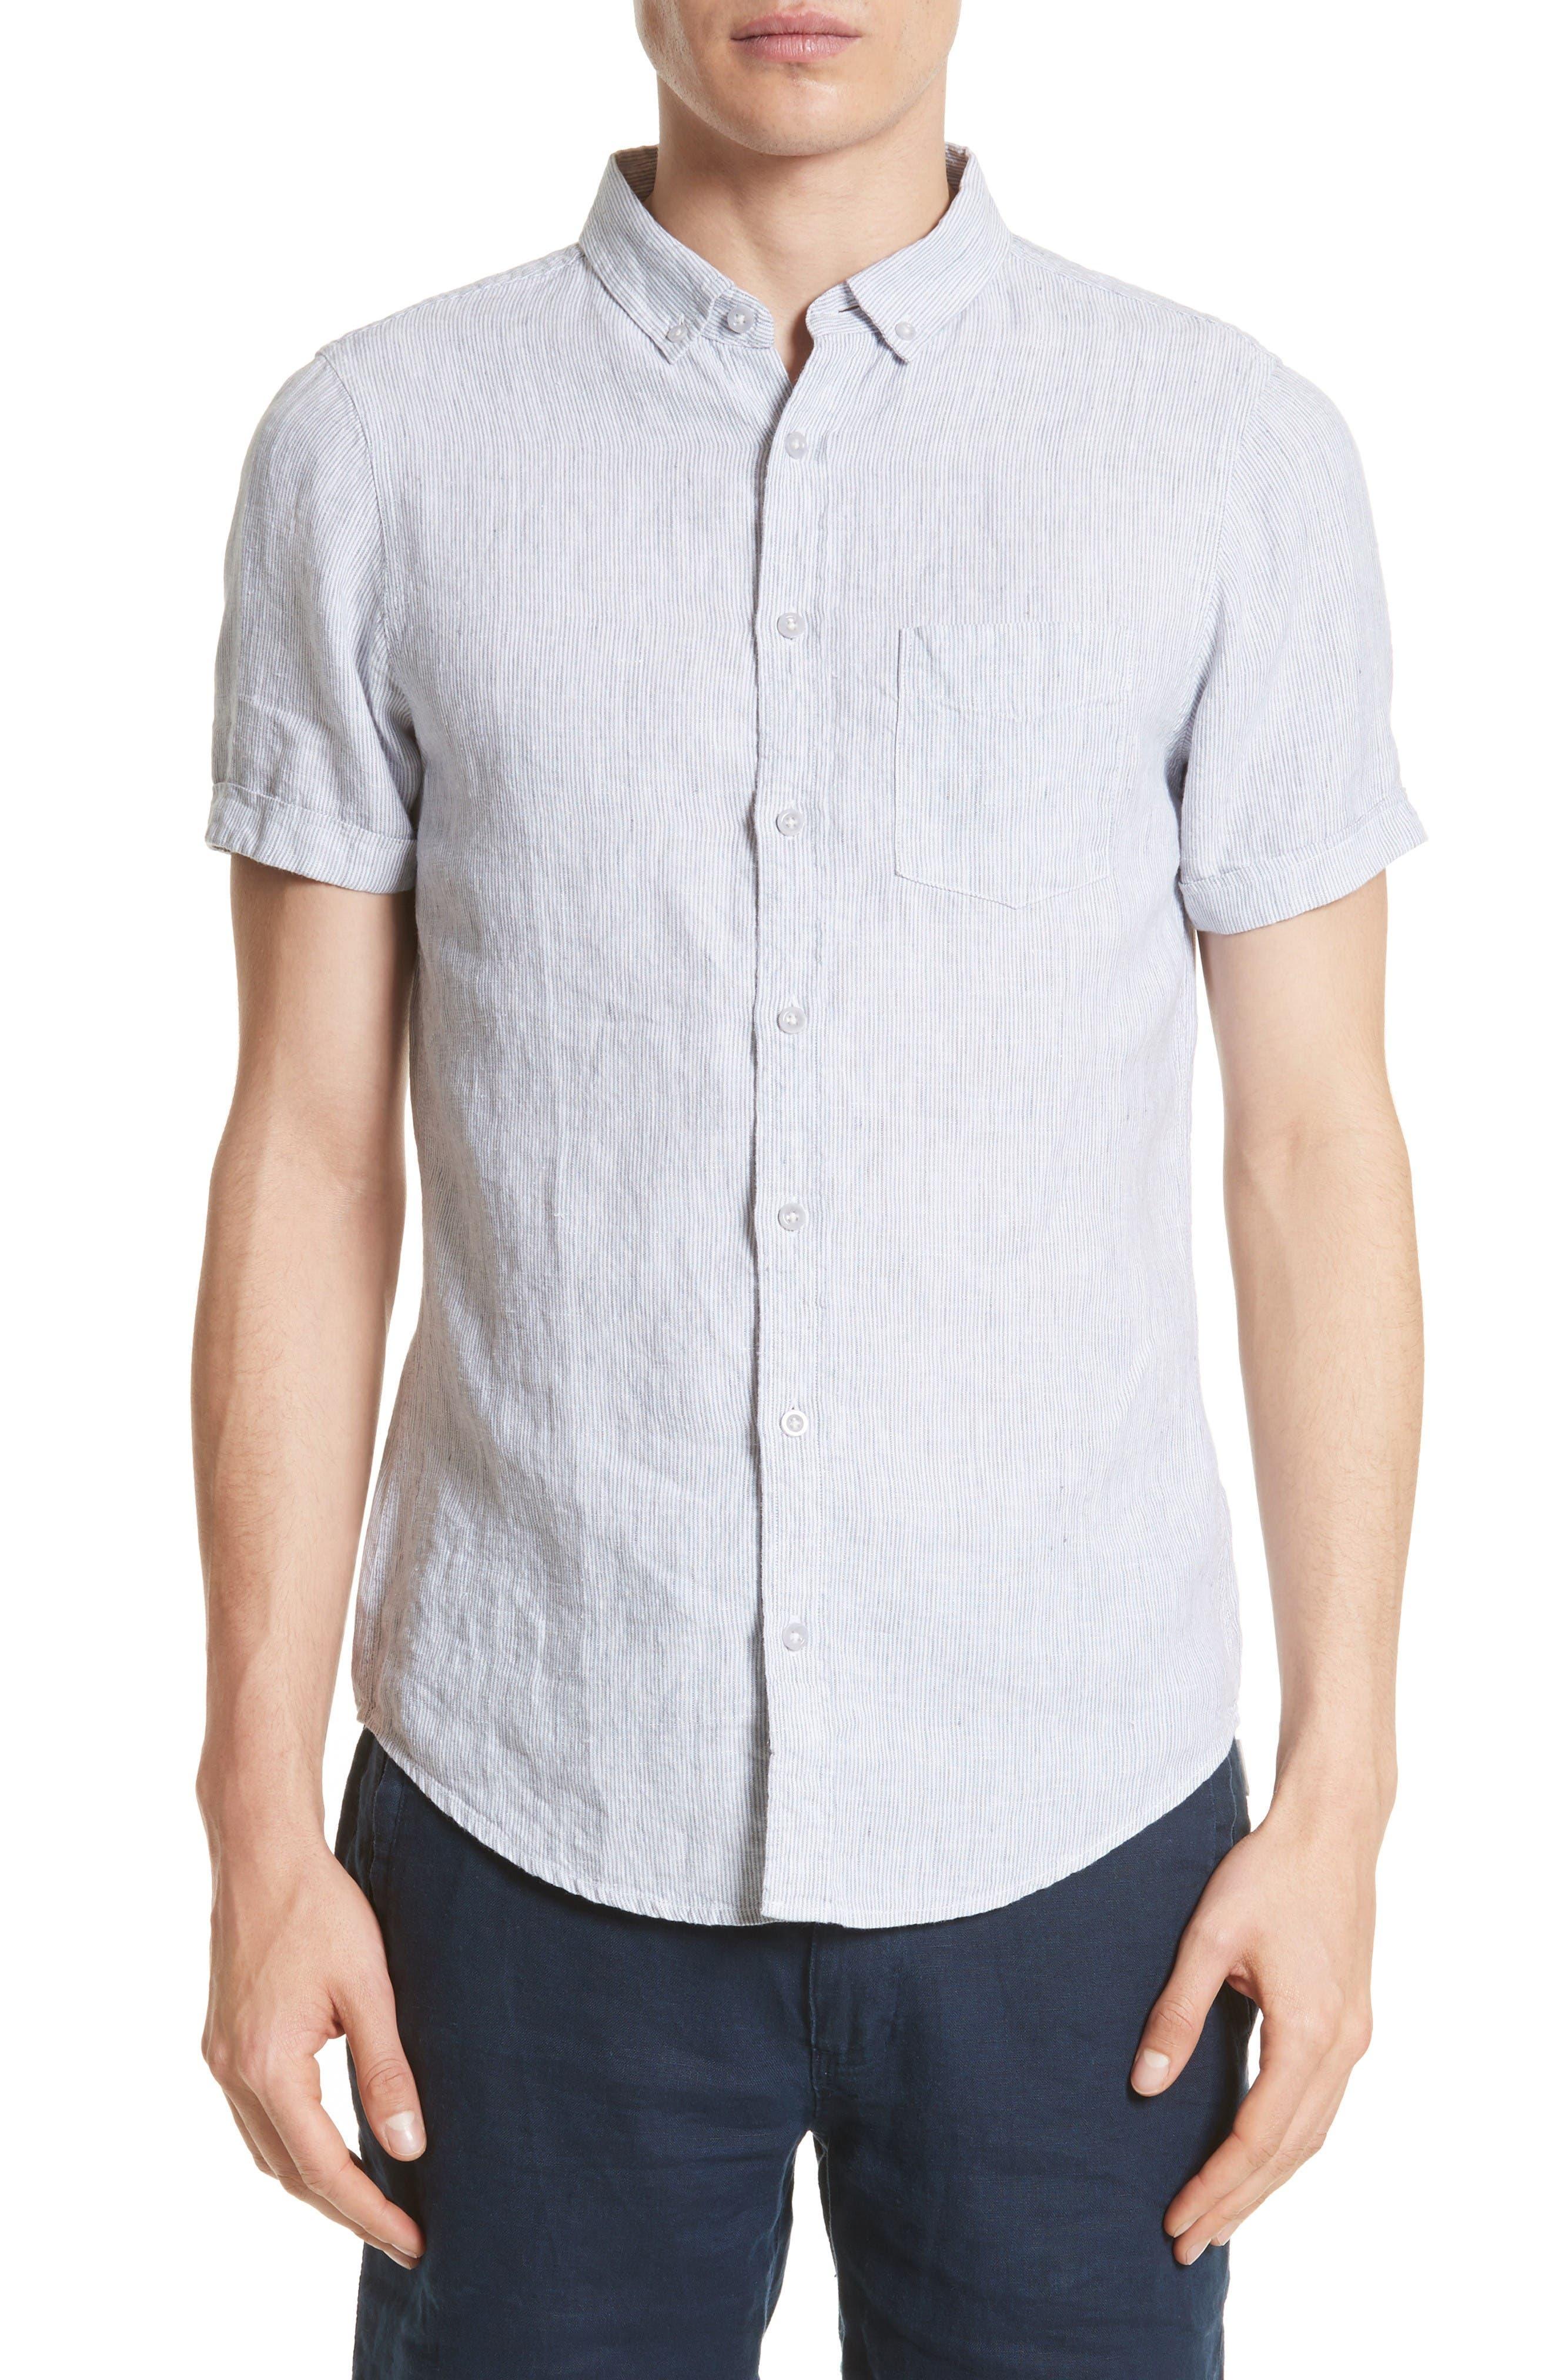 ONIA Trim Fit Microstripe Linen Shirt